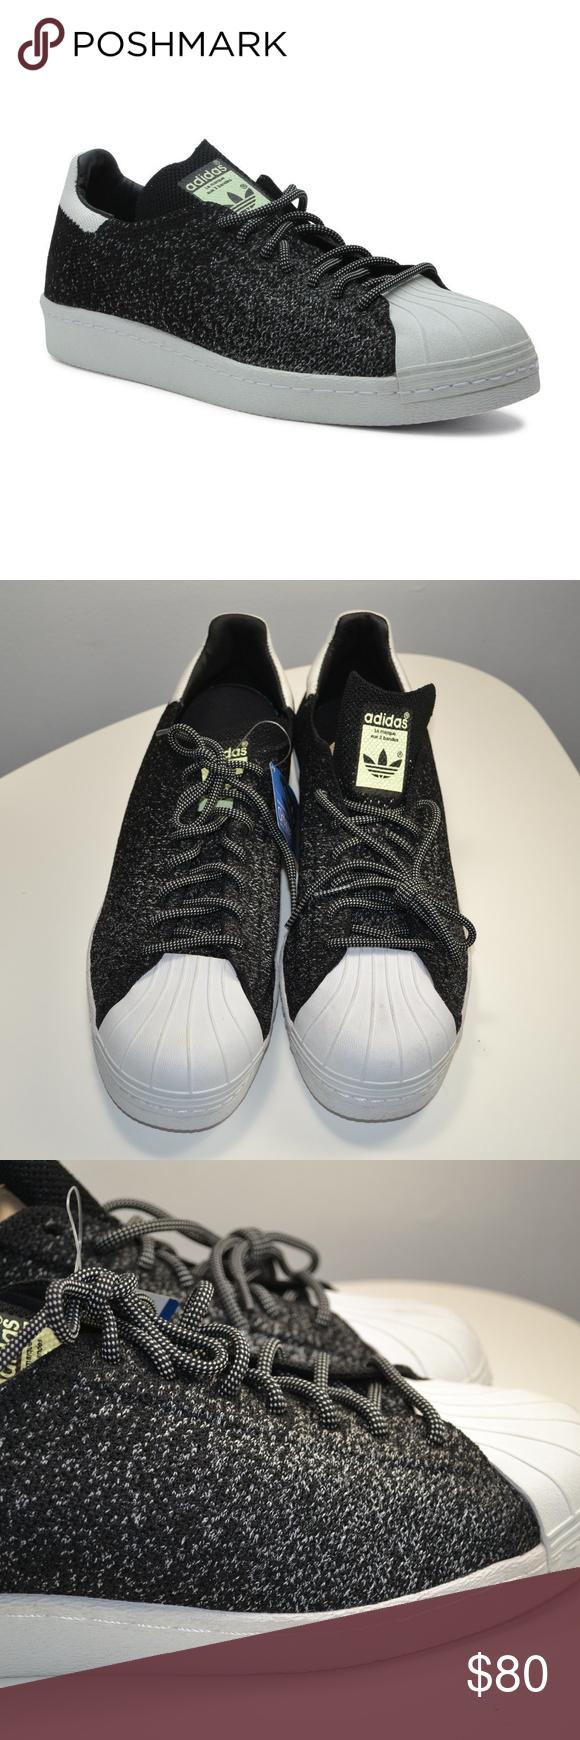 Adidas superstar degli anni ottanta fosforescenti, scarpe sz 12 pinterest